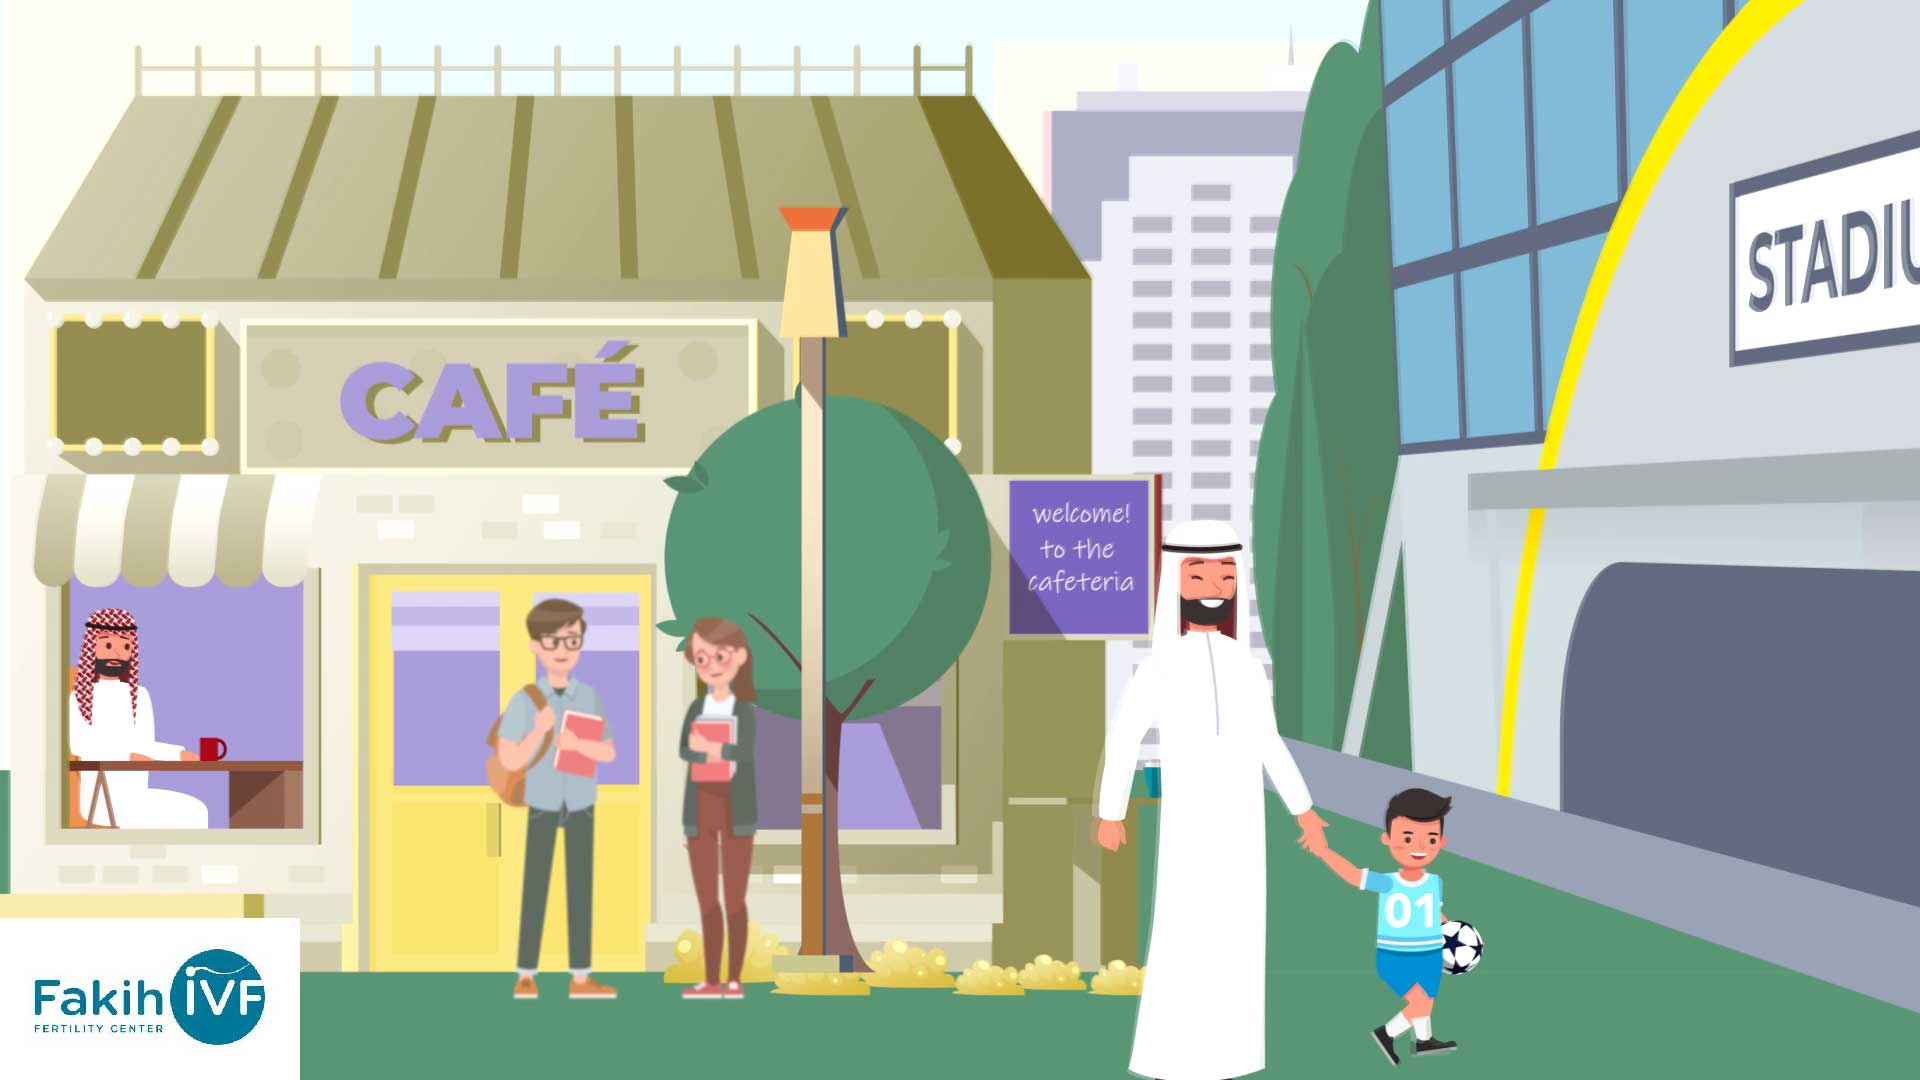 Animation Video for Fakih IVF Fertility Center